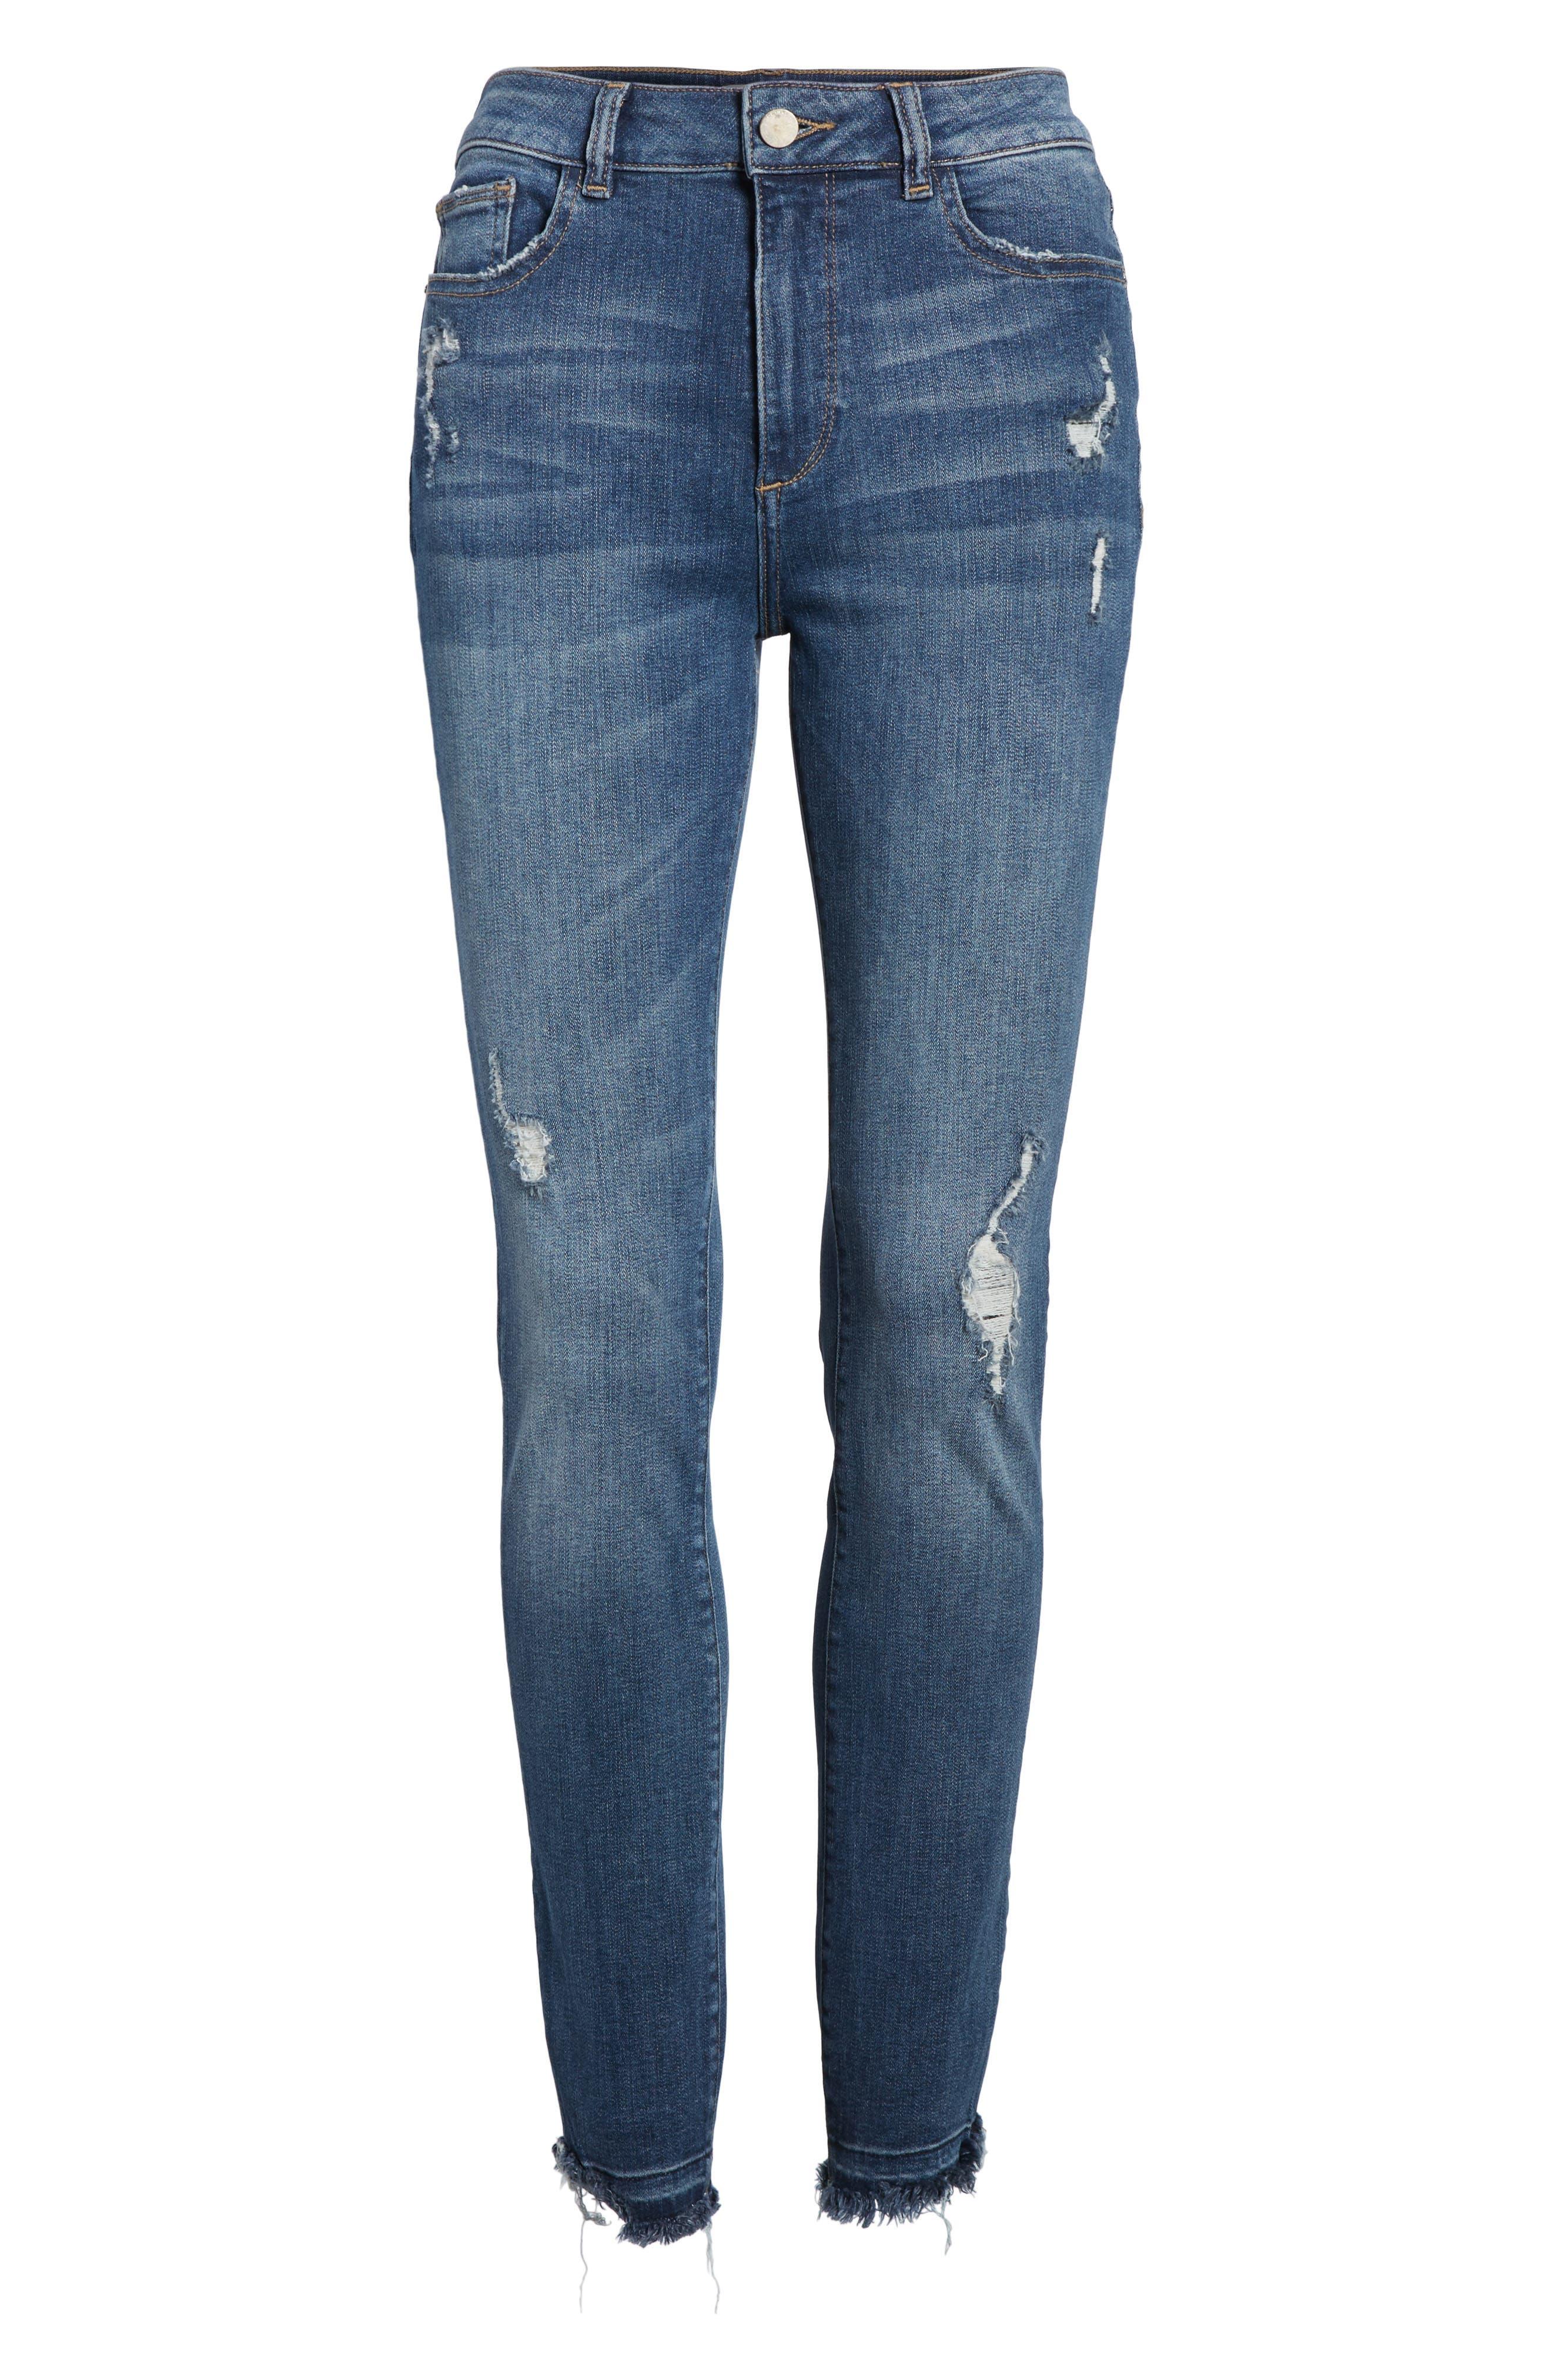 Farrow Instaslim High Waist Skinny Jeans,                             Alternate thumbnail 7, color,                             426